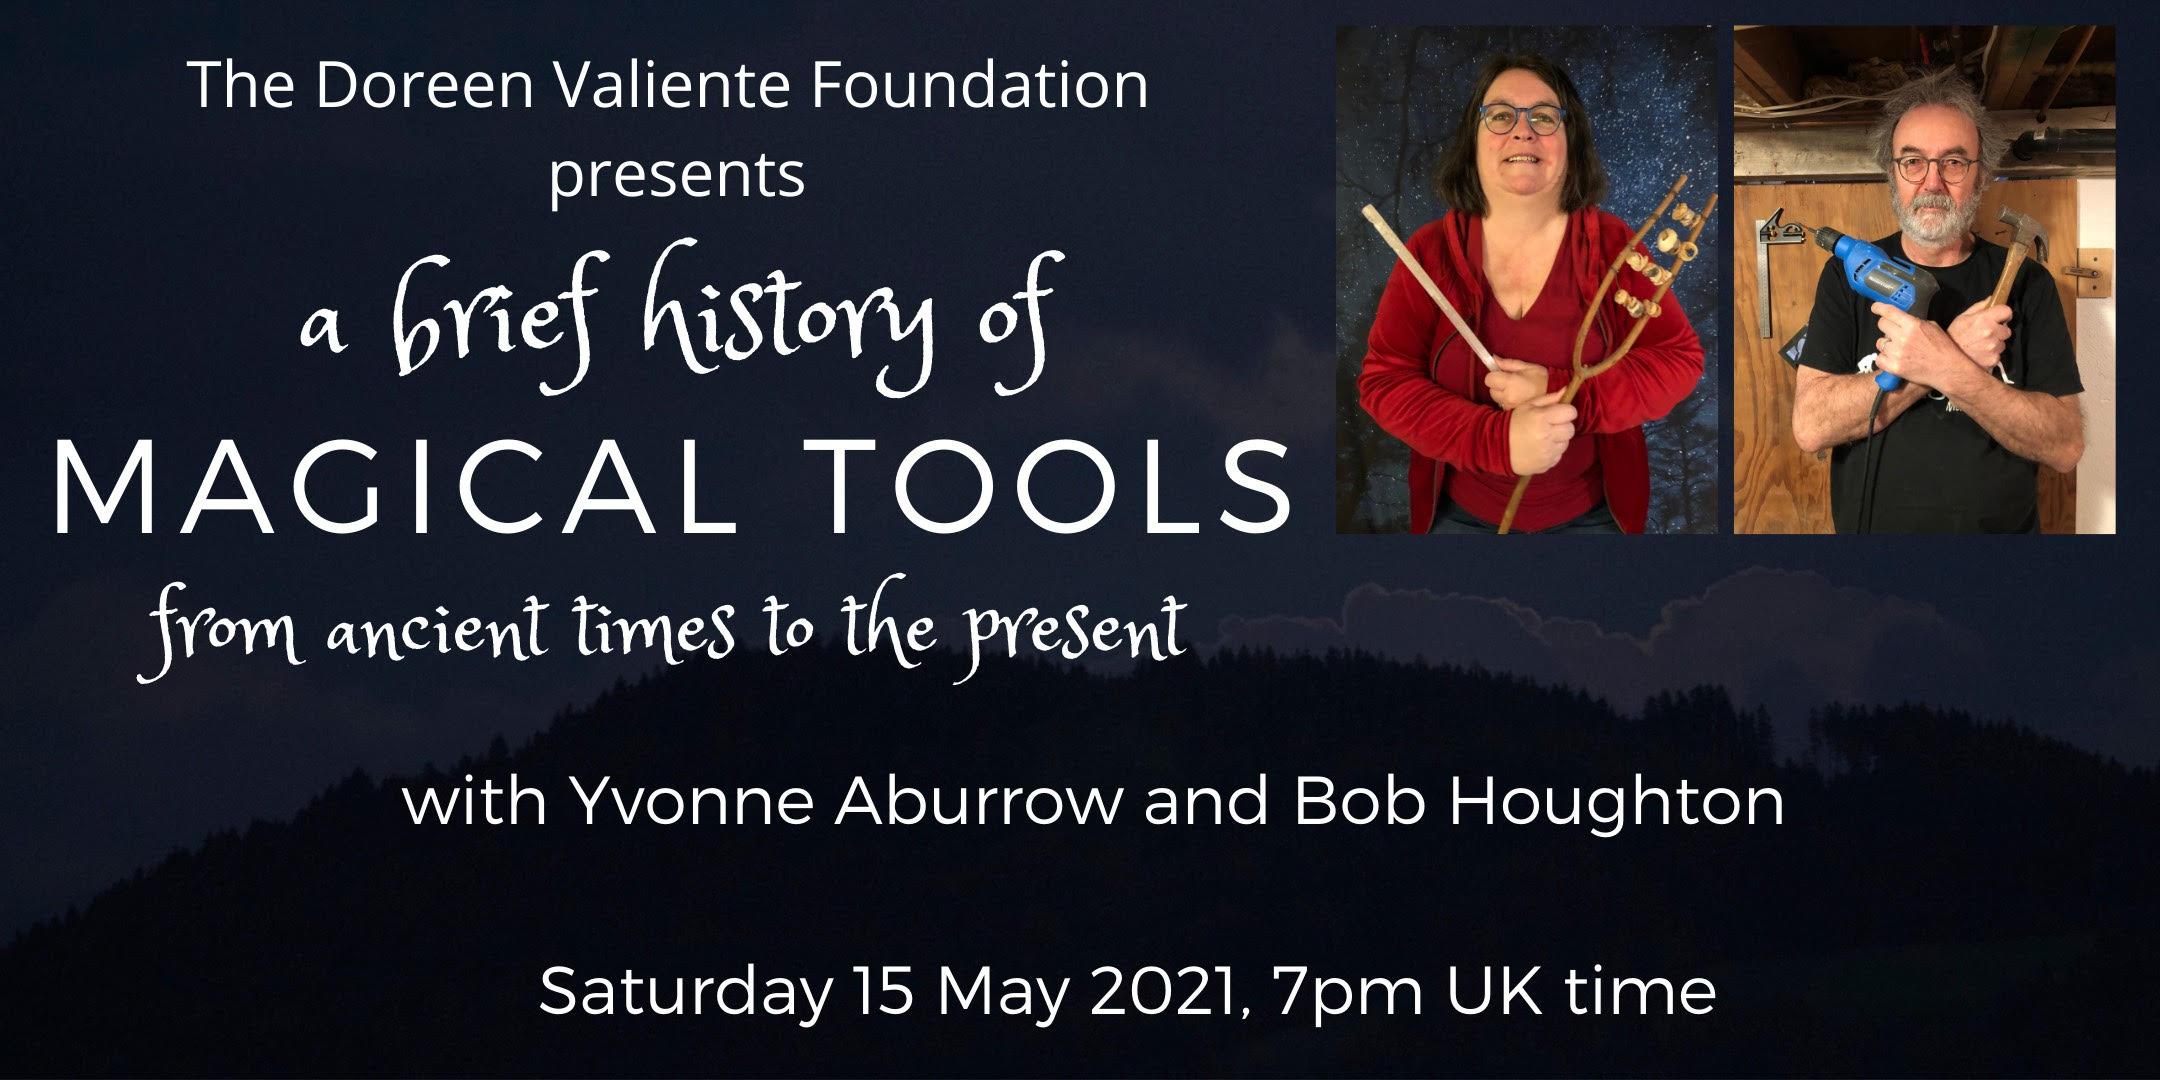 A Brief History of Magical Tools